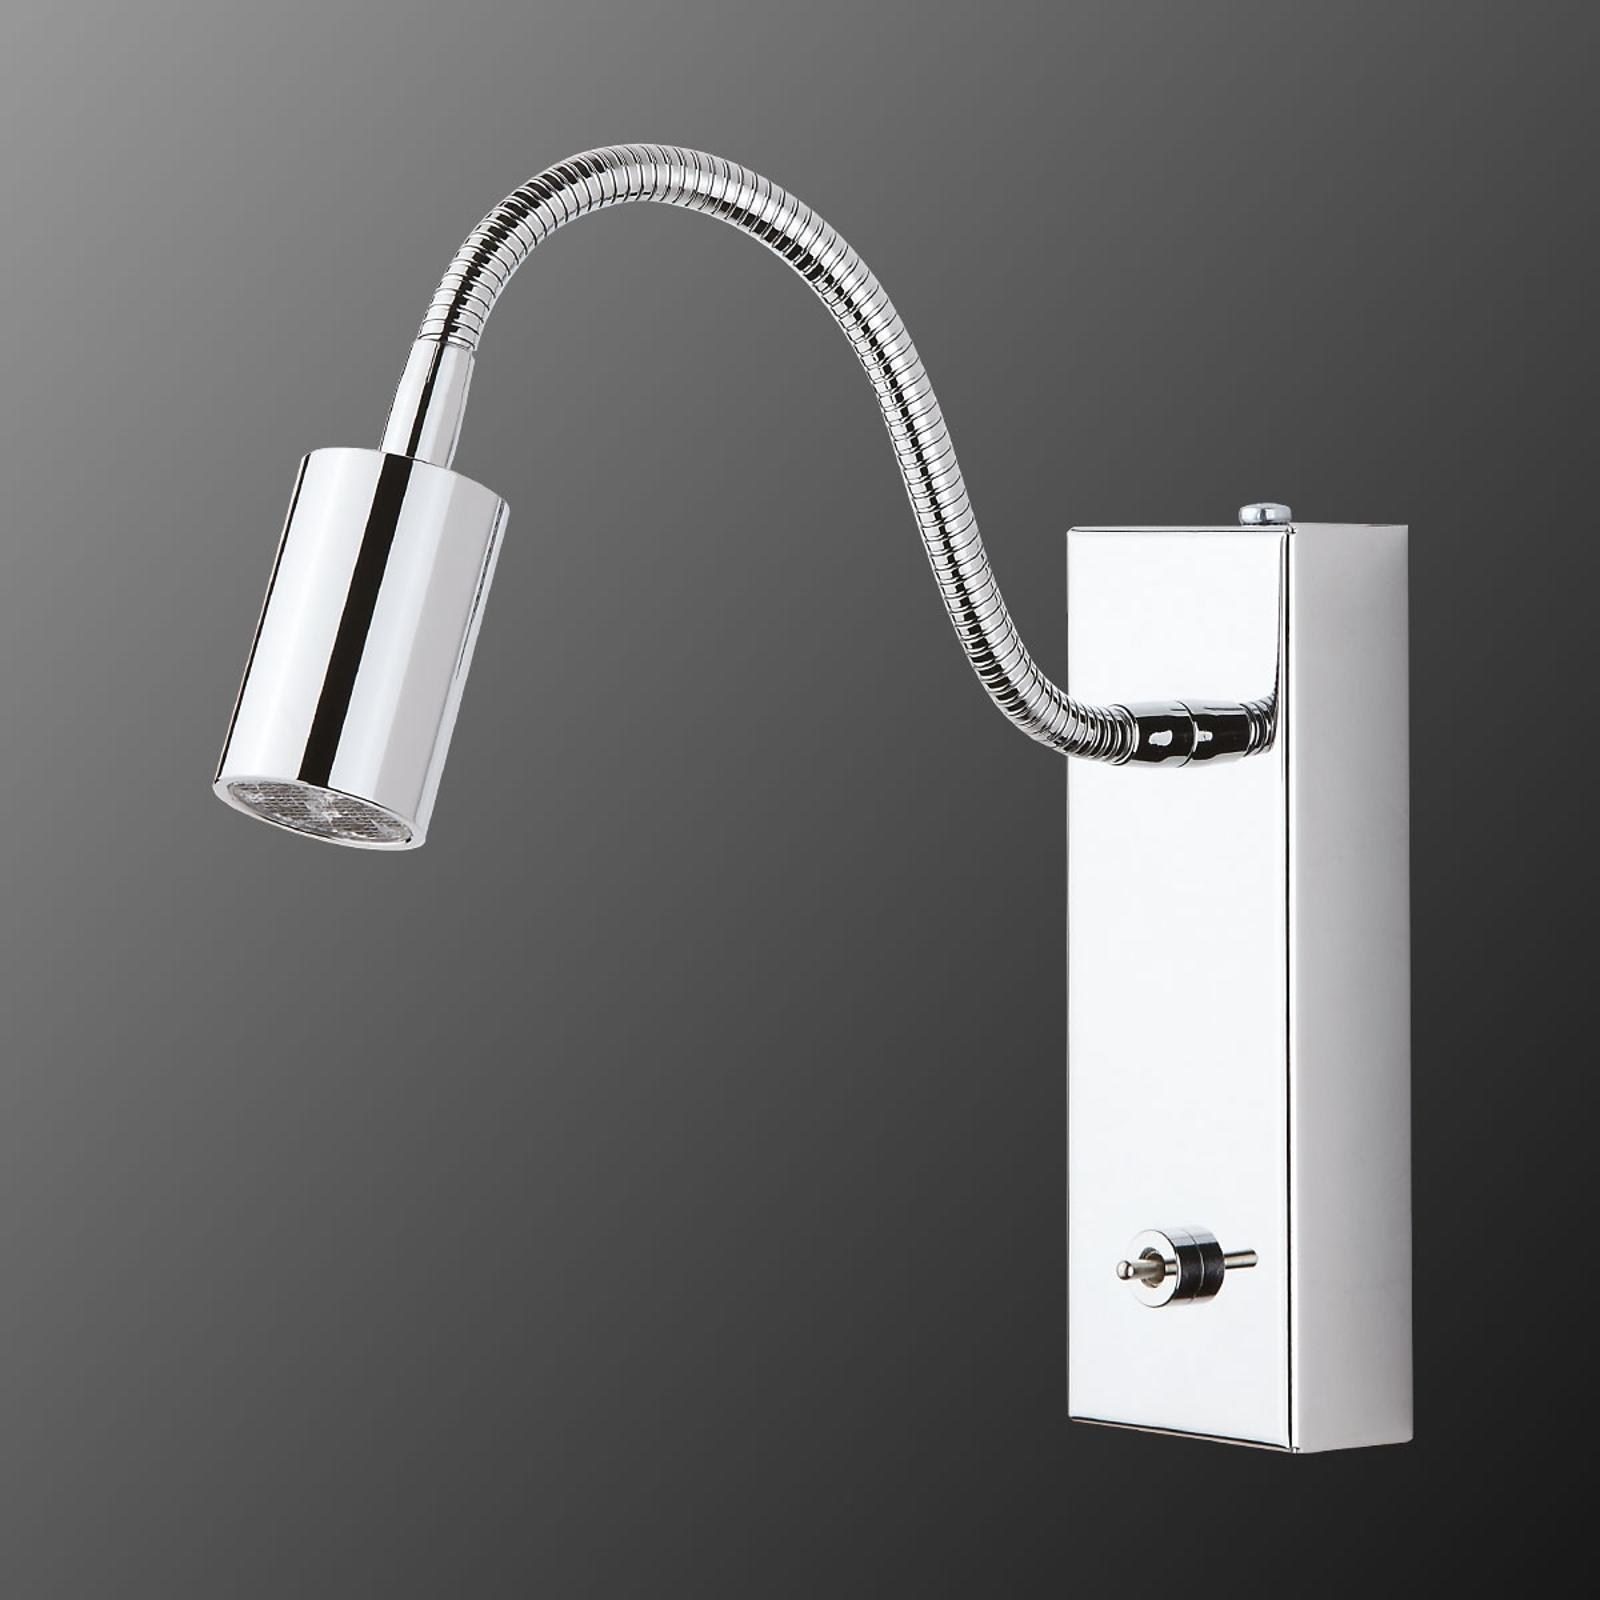 Aplique LED móvil con interruptor